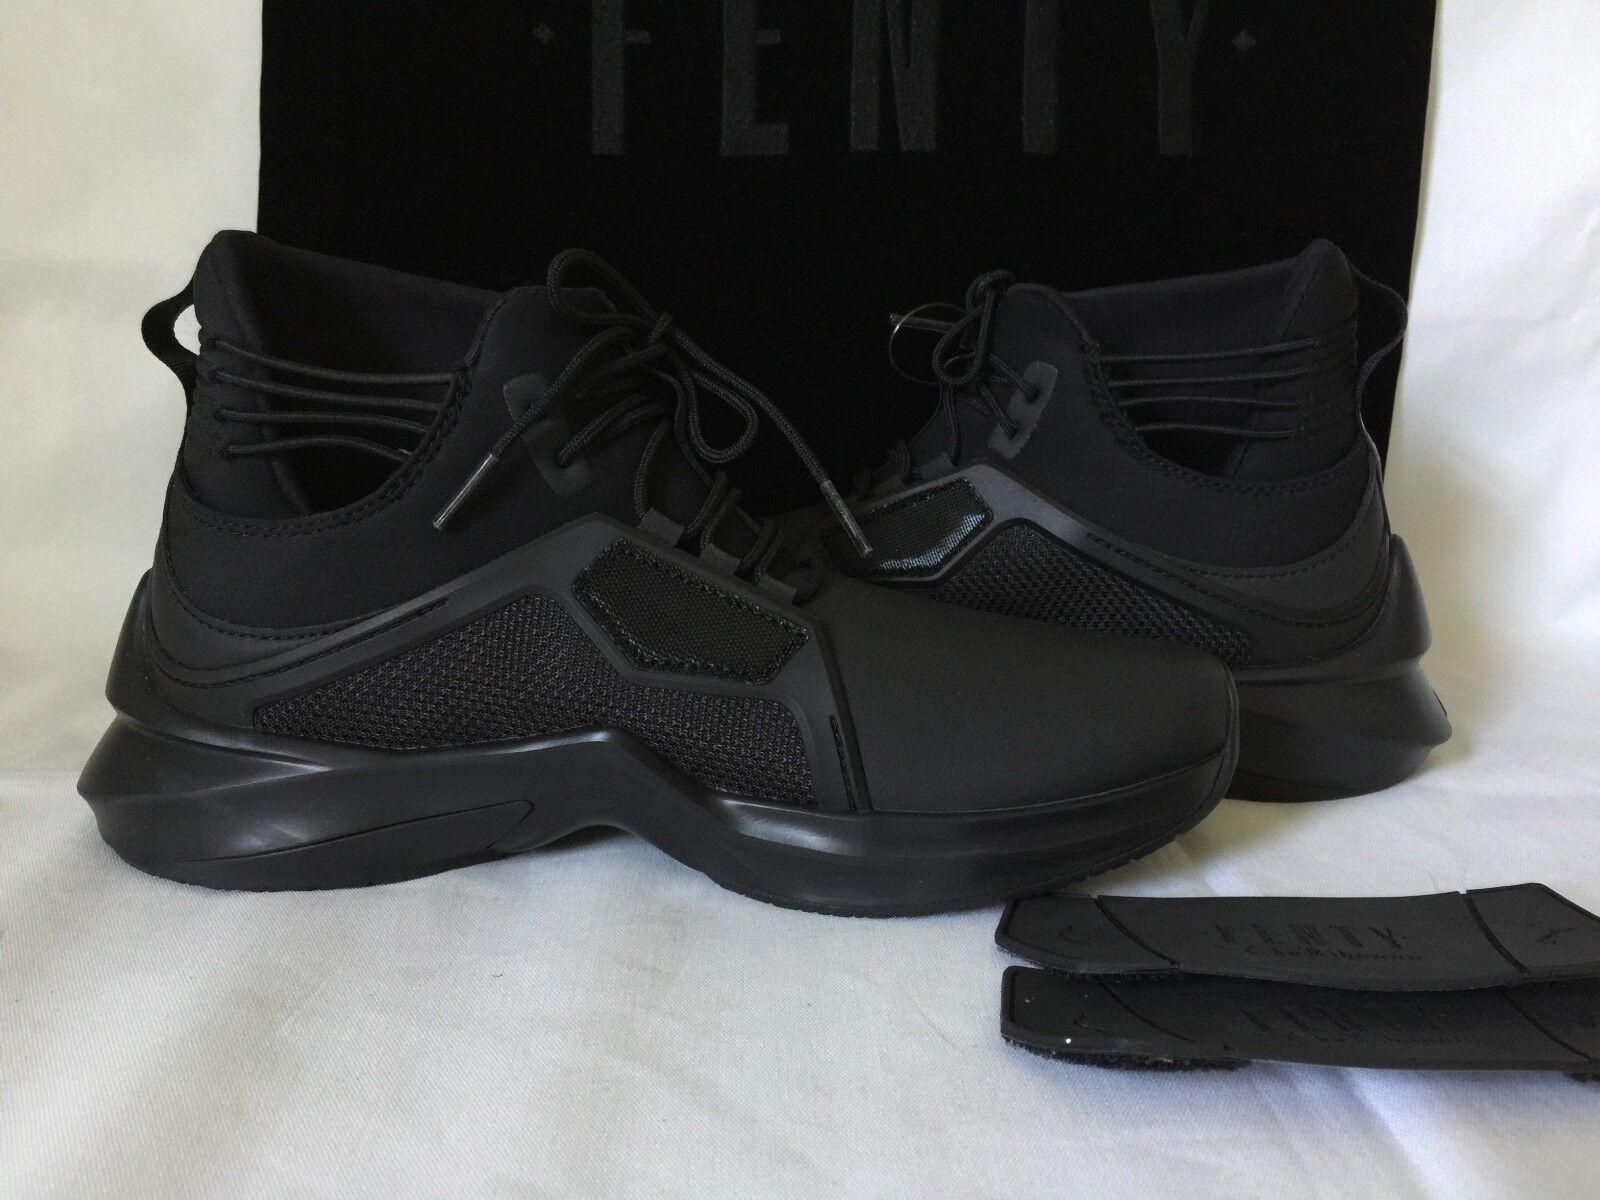 NEU WOMEN'S PUMA &  RIHANNA THE TRAINER HI BY FENTY BLACK Schuhe Sz 7.5